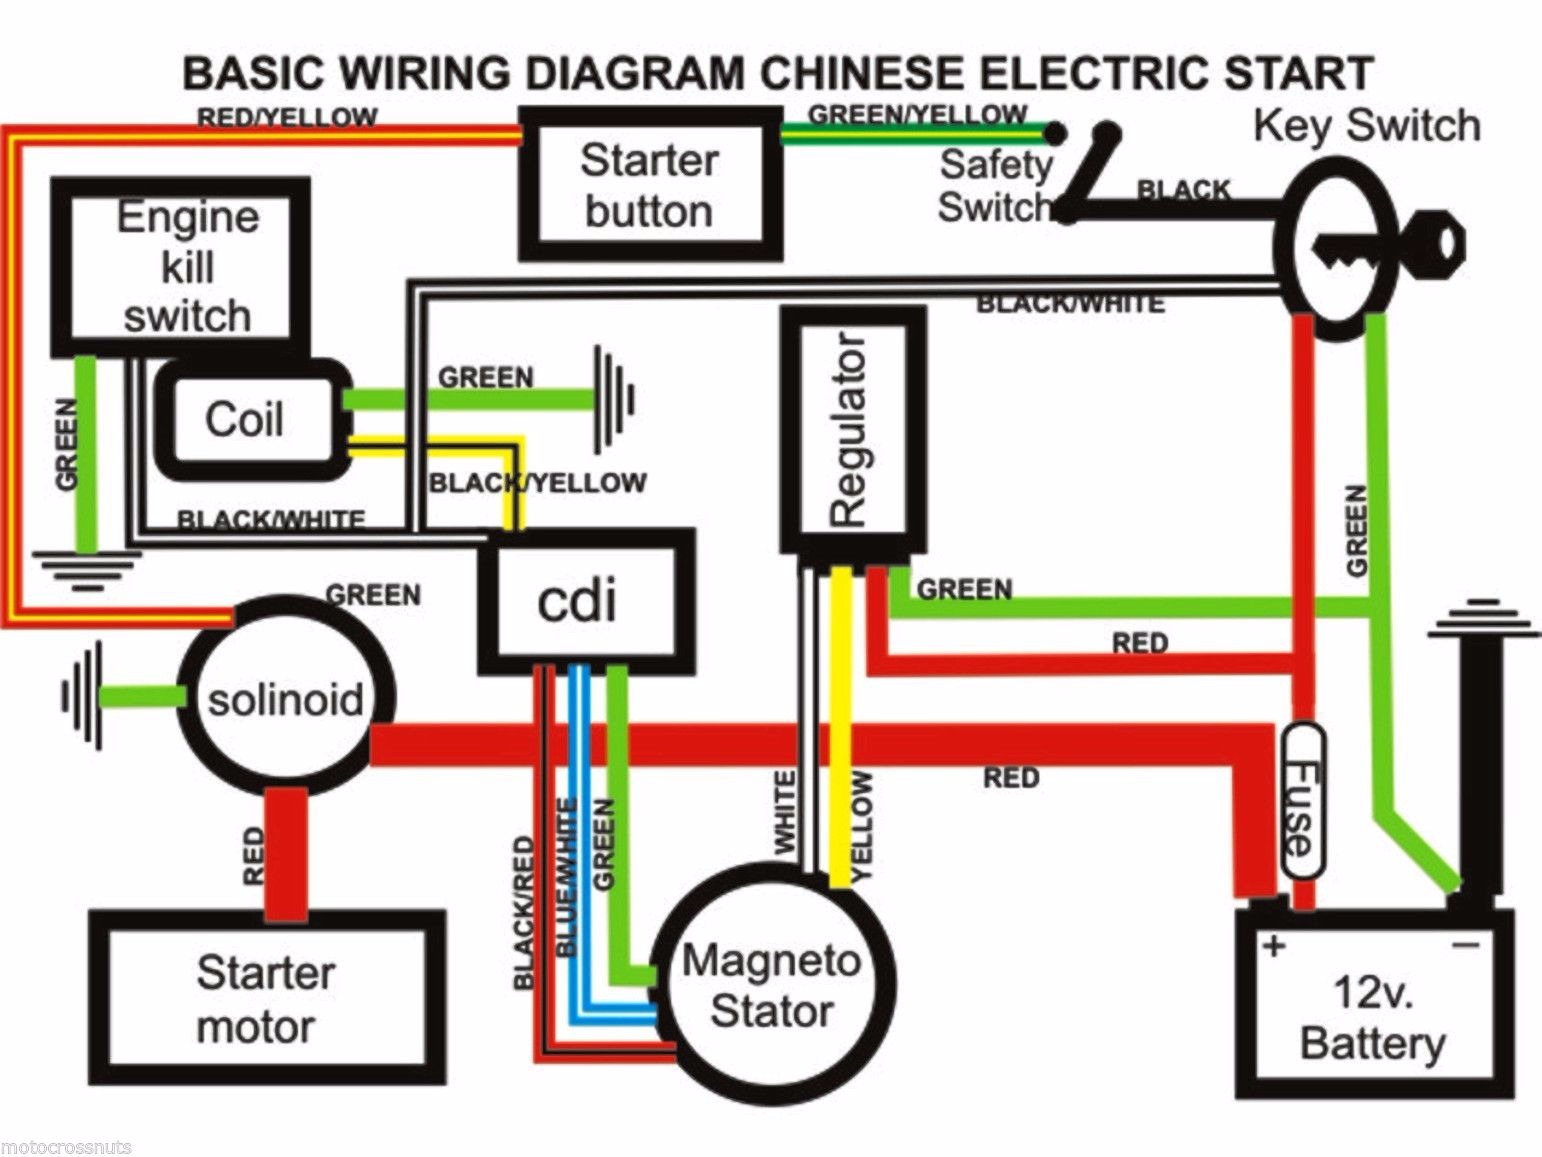 kazuma 49cc quad wiring diagram thetford caravan toilet atv s2 wingblog de 125cc pit bike library rh 58 wibovanrossum nl